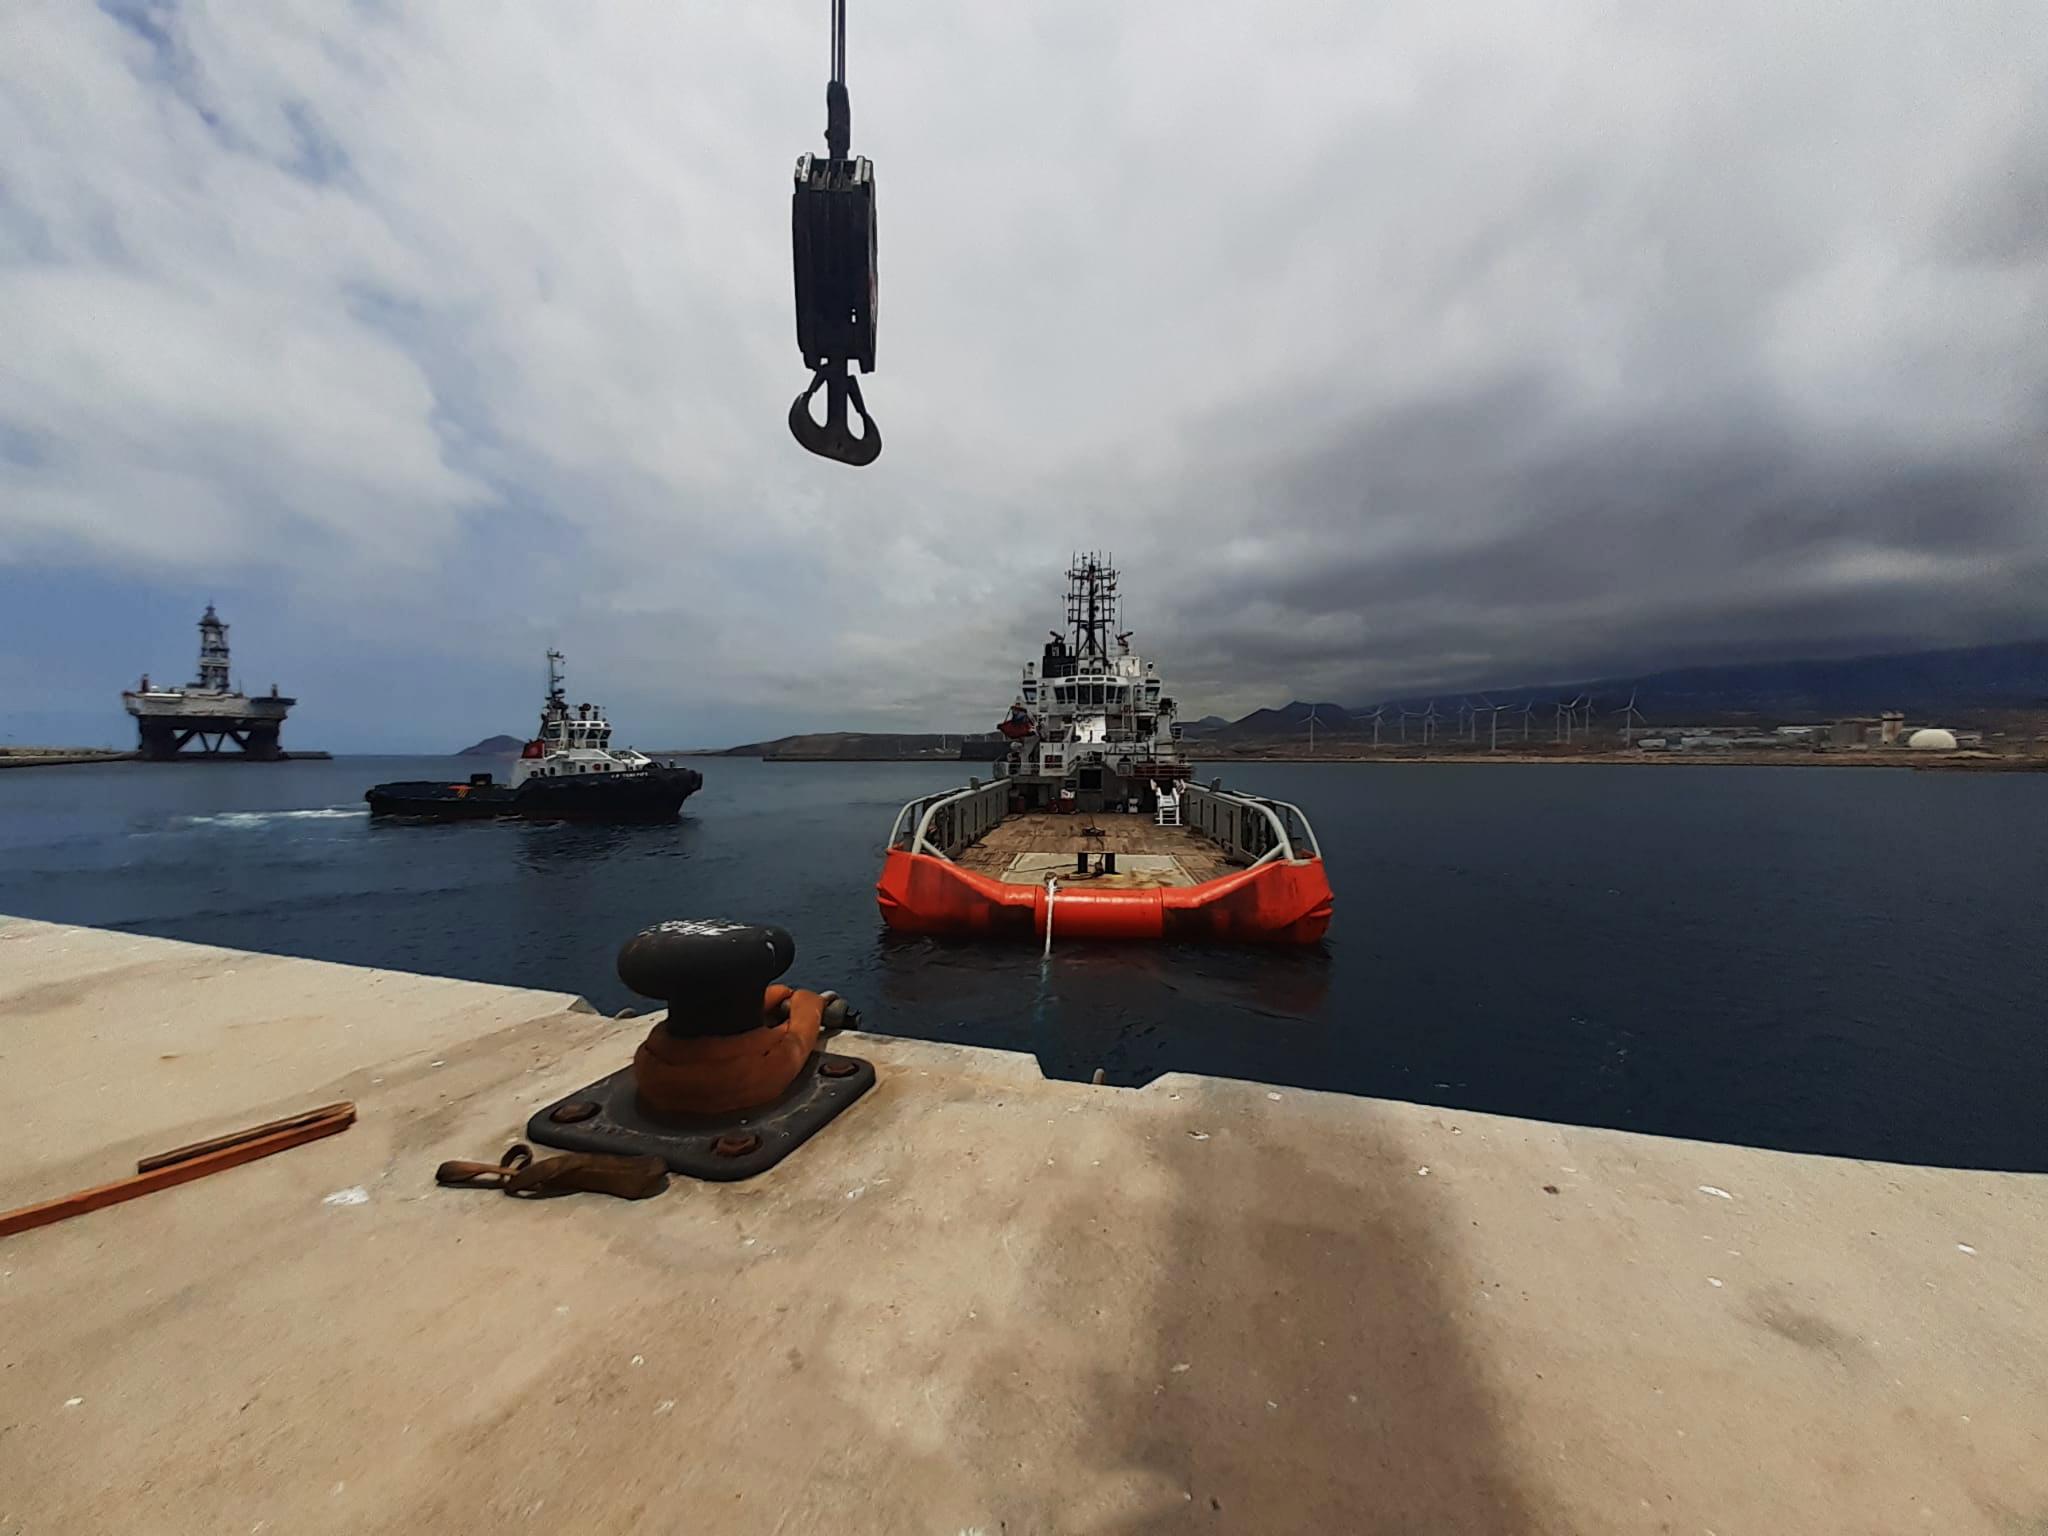 Bollard pull test in Tenerife by Tenerife Shipyards